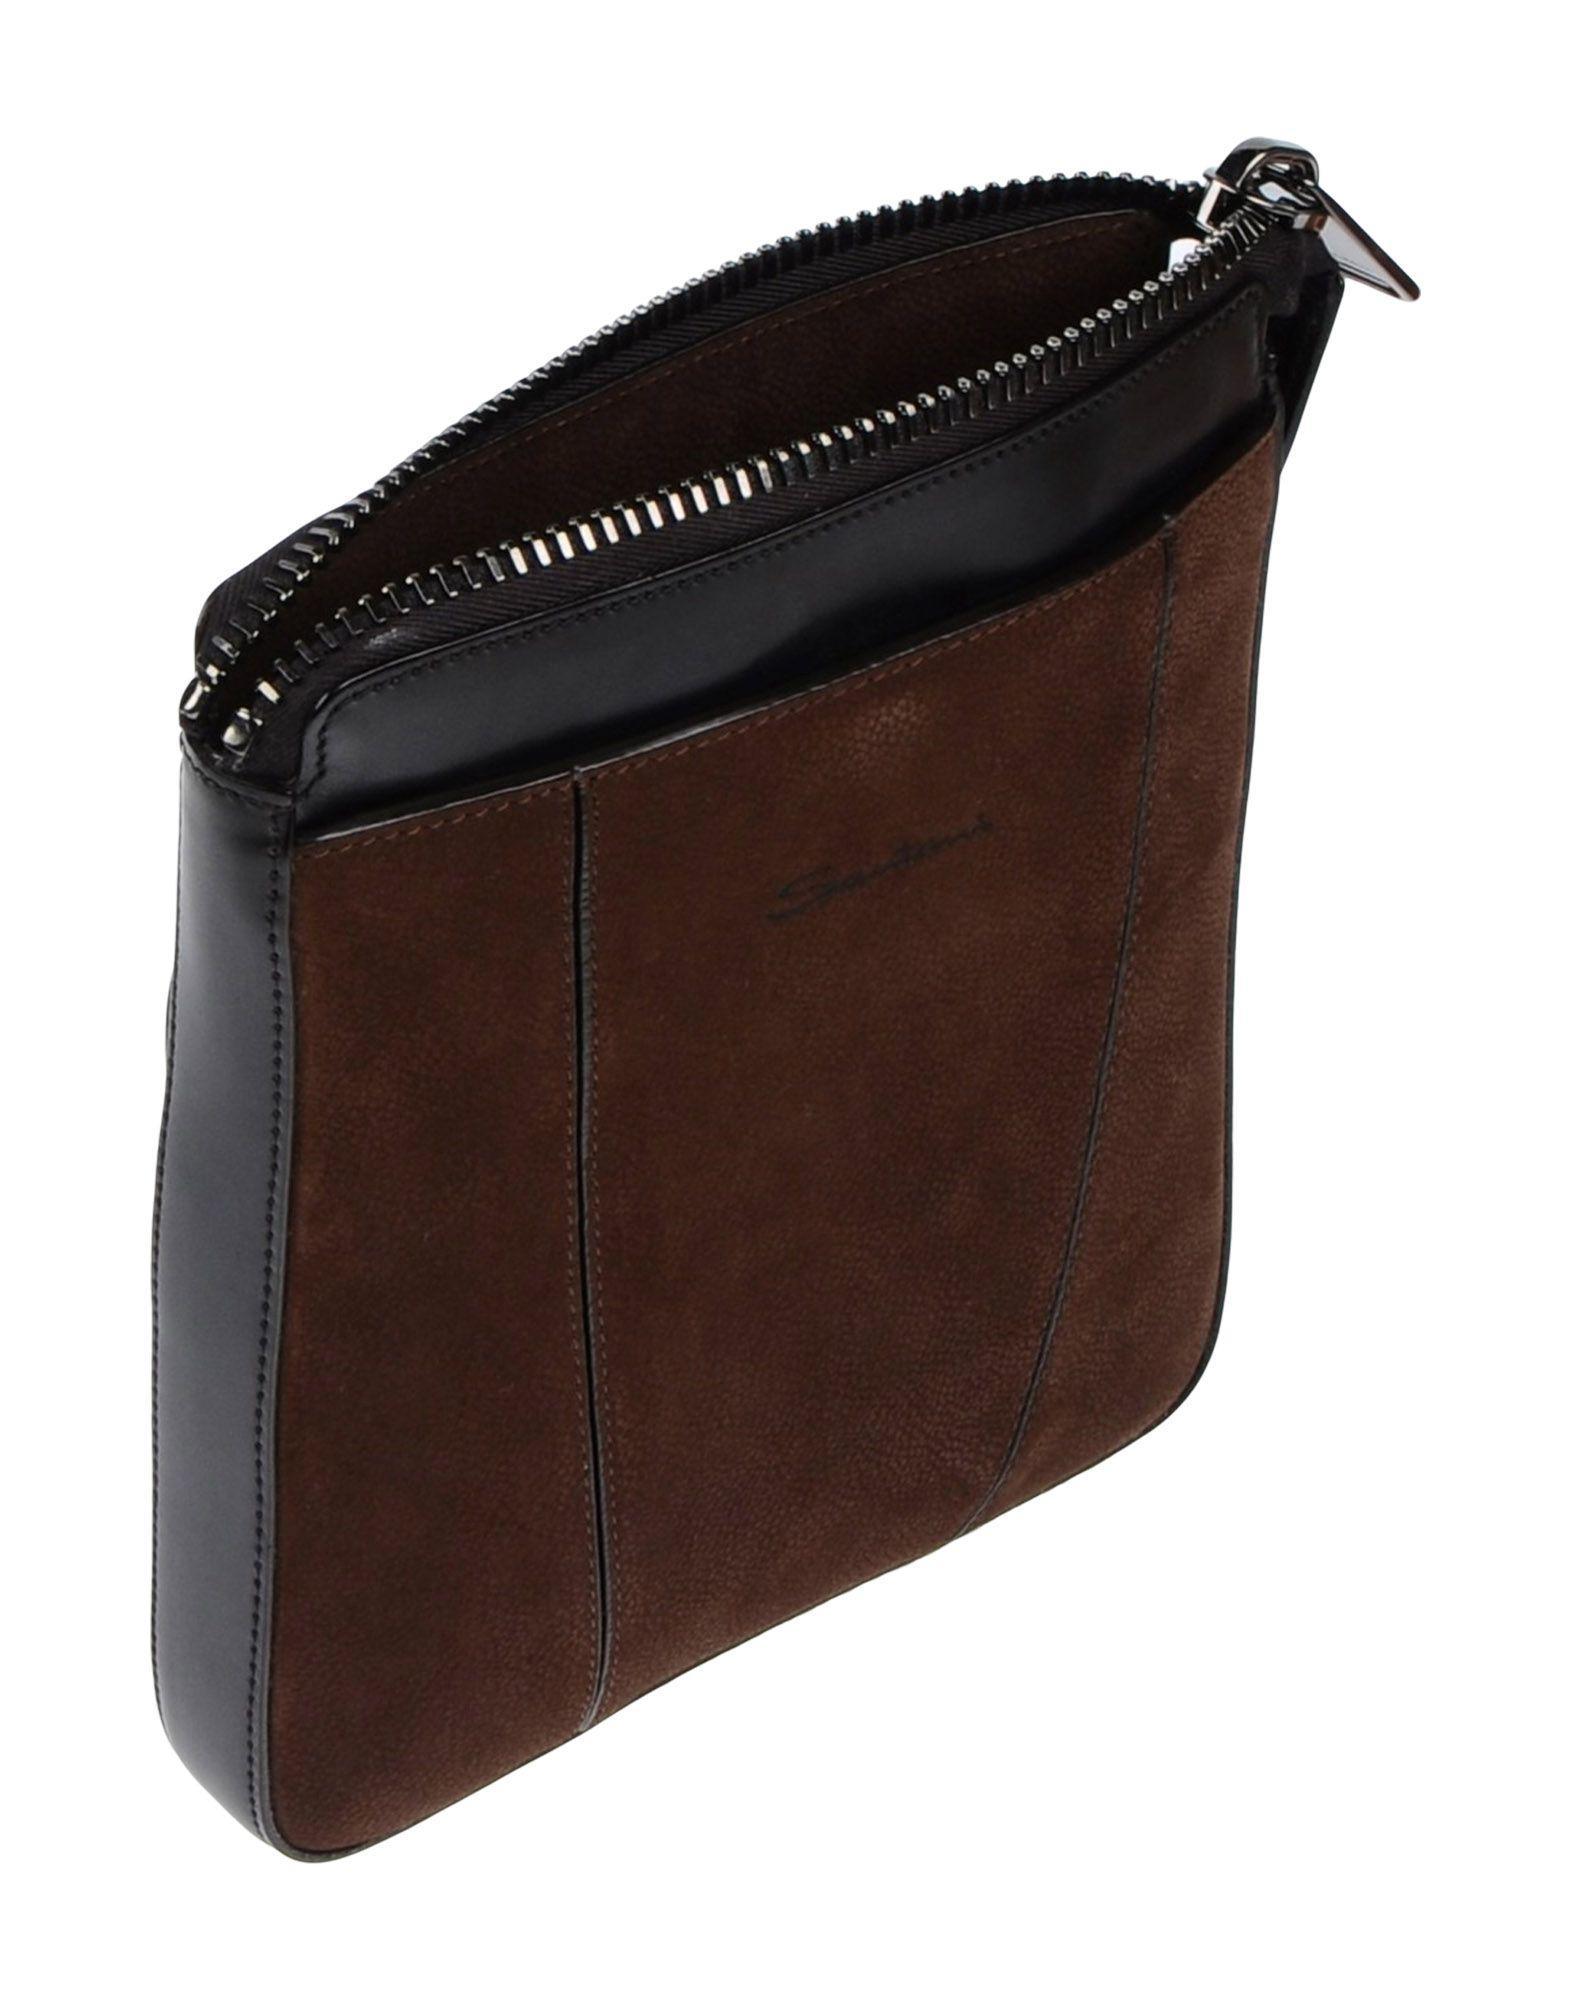 Santoni Leather Cross-body Bag in Dark Brown (Brown) for Men